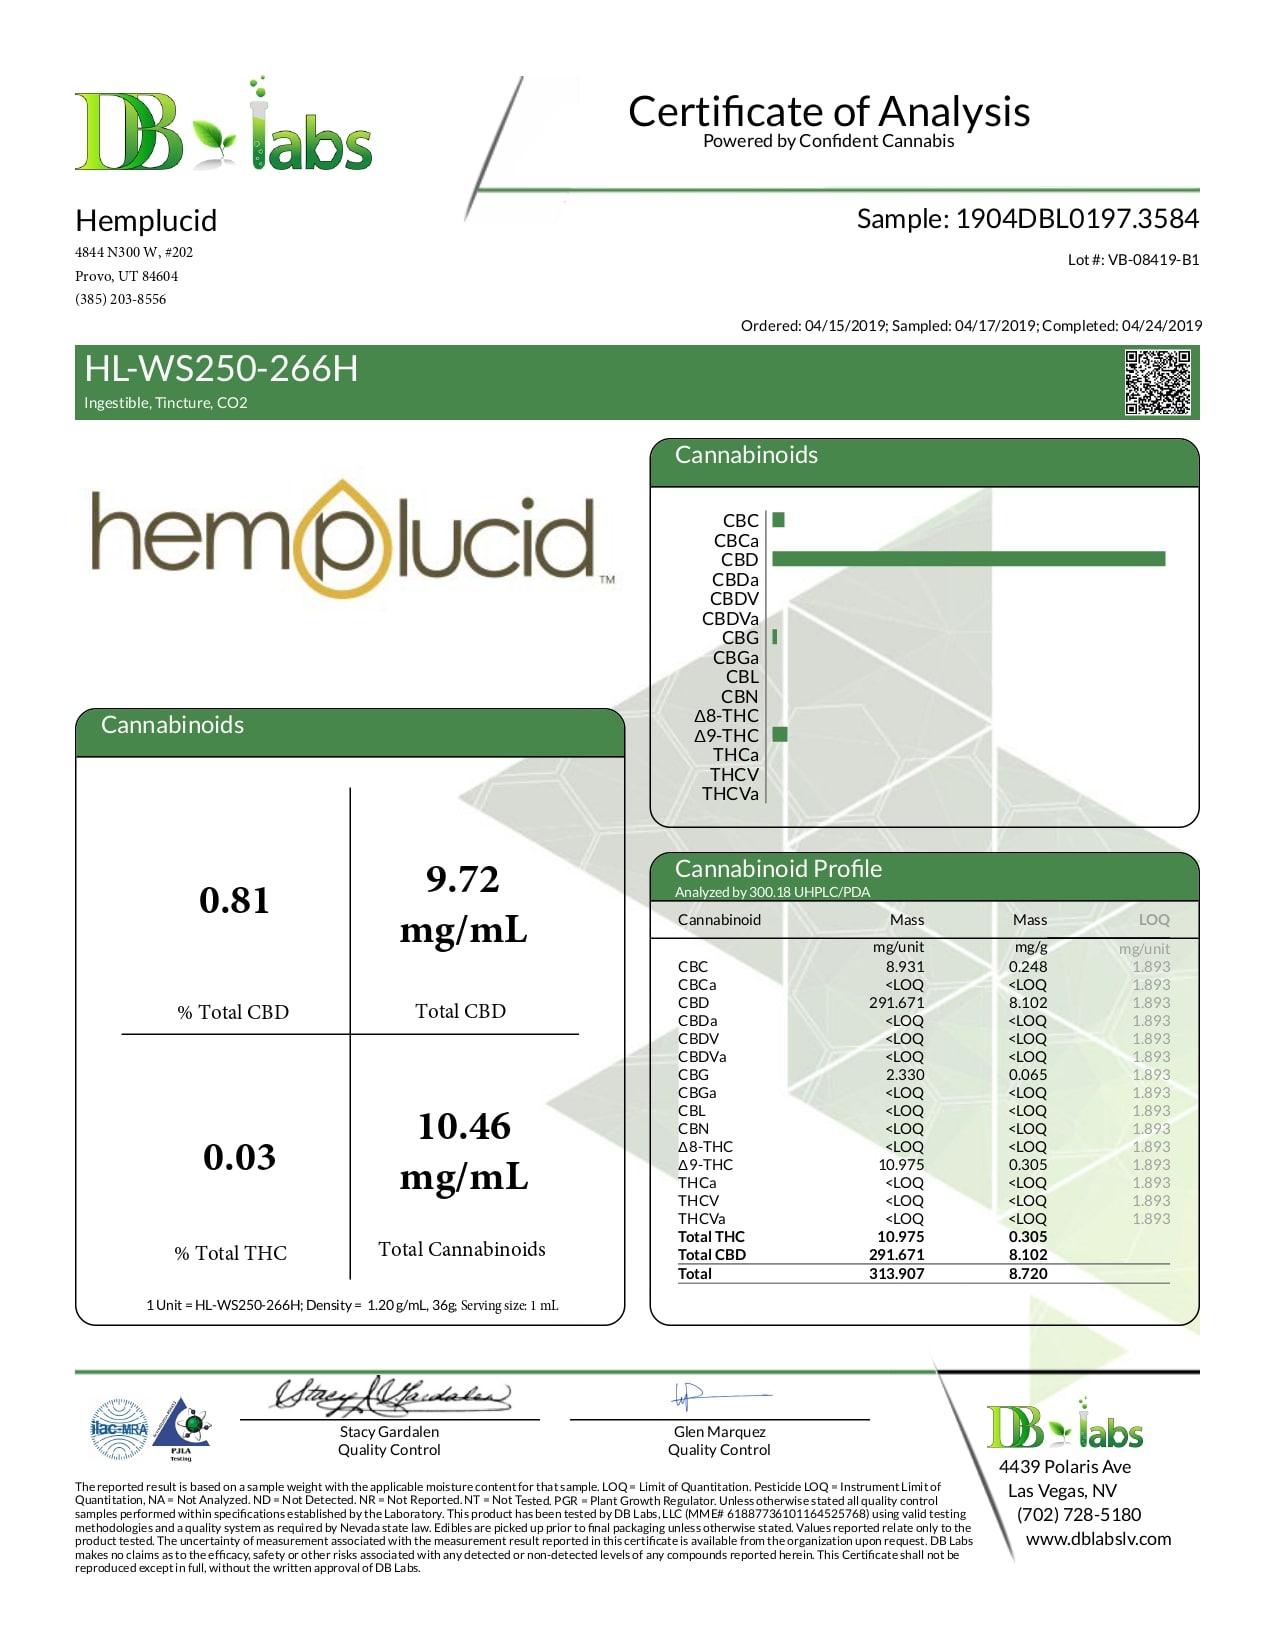 Hemplucid Full Spectrum CBD Water Soluble 250mg Lab Report